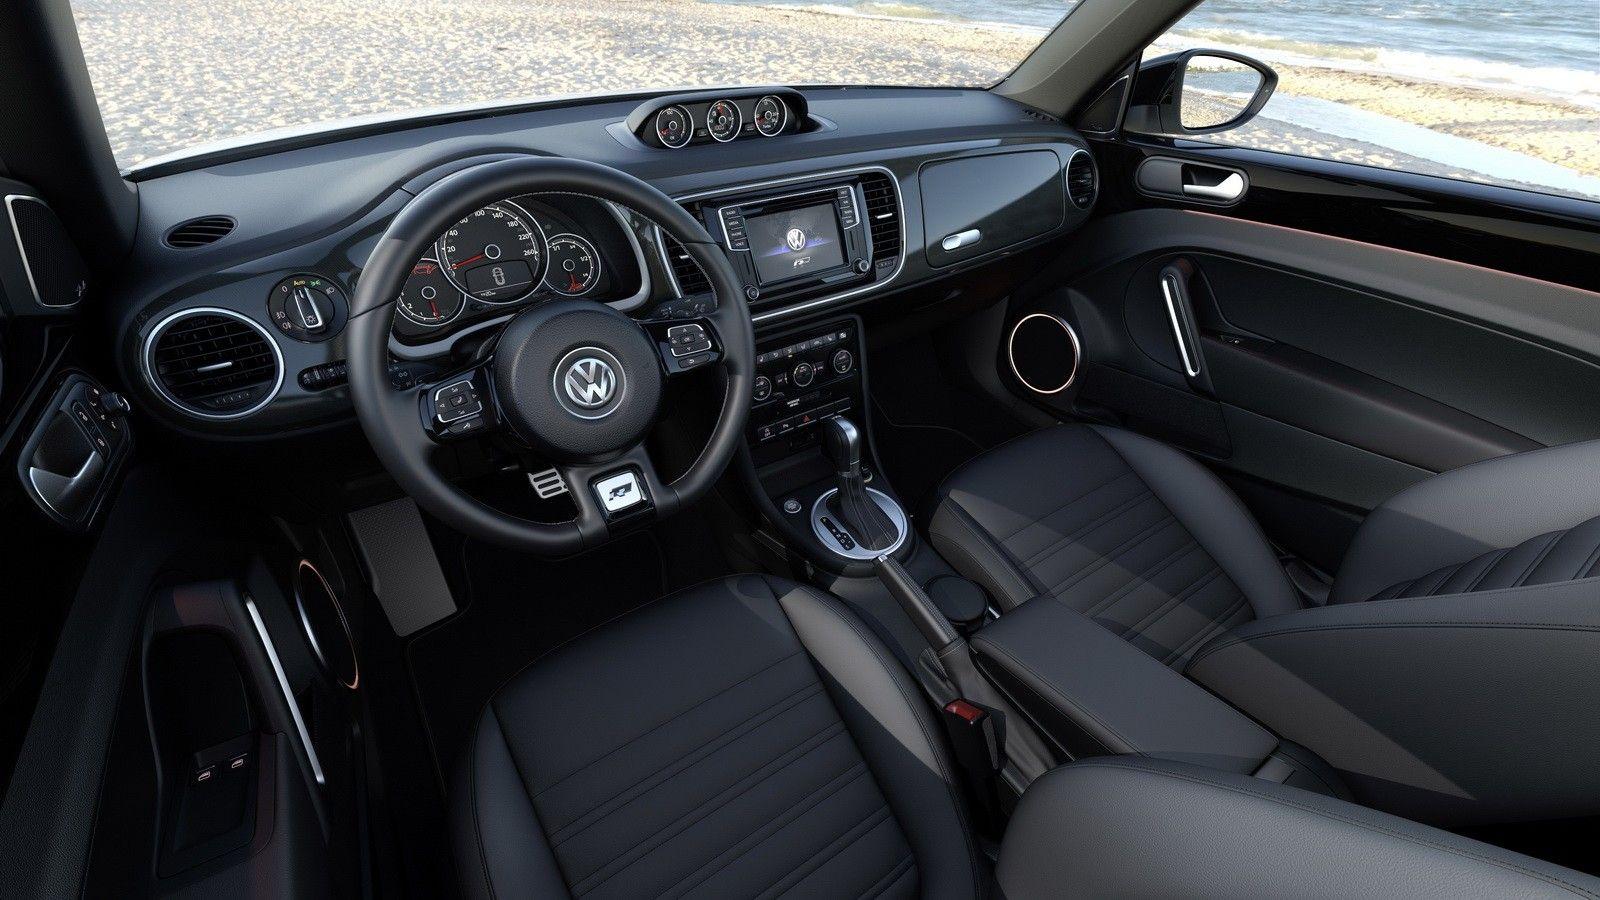 Resultado De Imagem Para Interior New Beetle 2017 Volkswagen Beetle Interior Volkswagen New Beetle Volkswagen Beetle